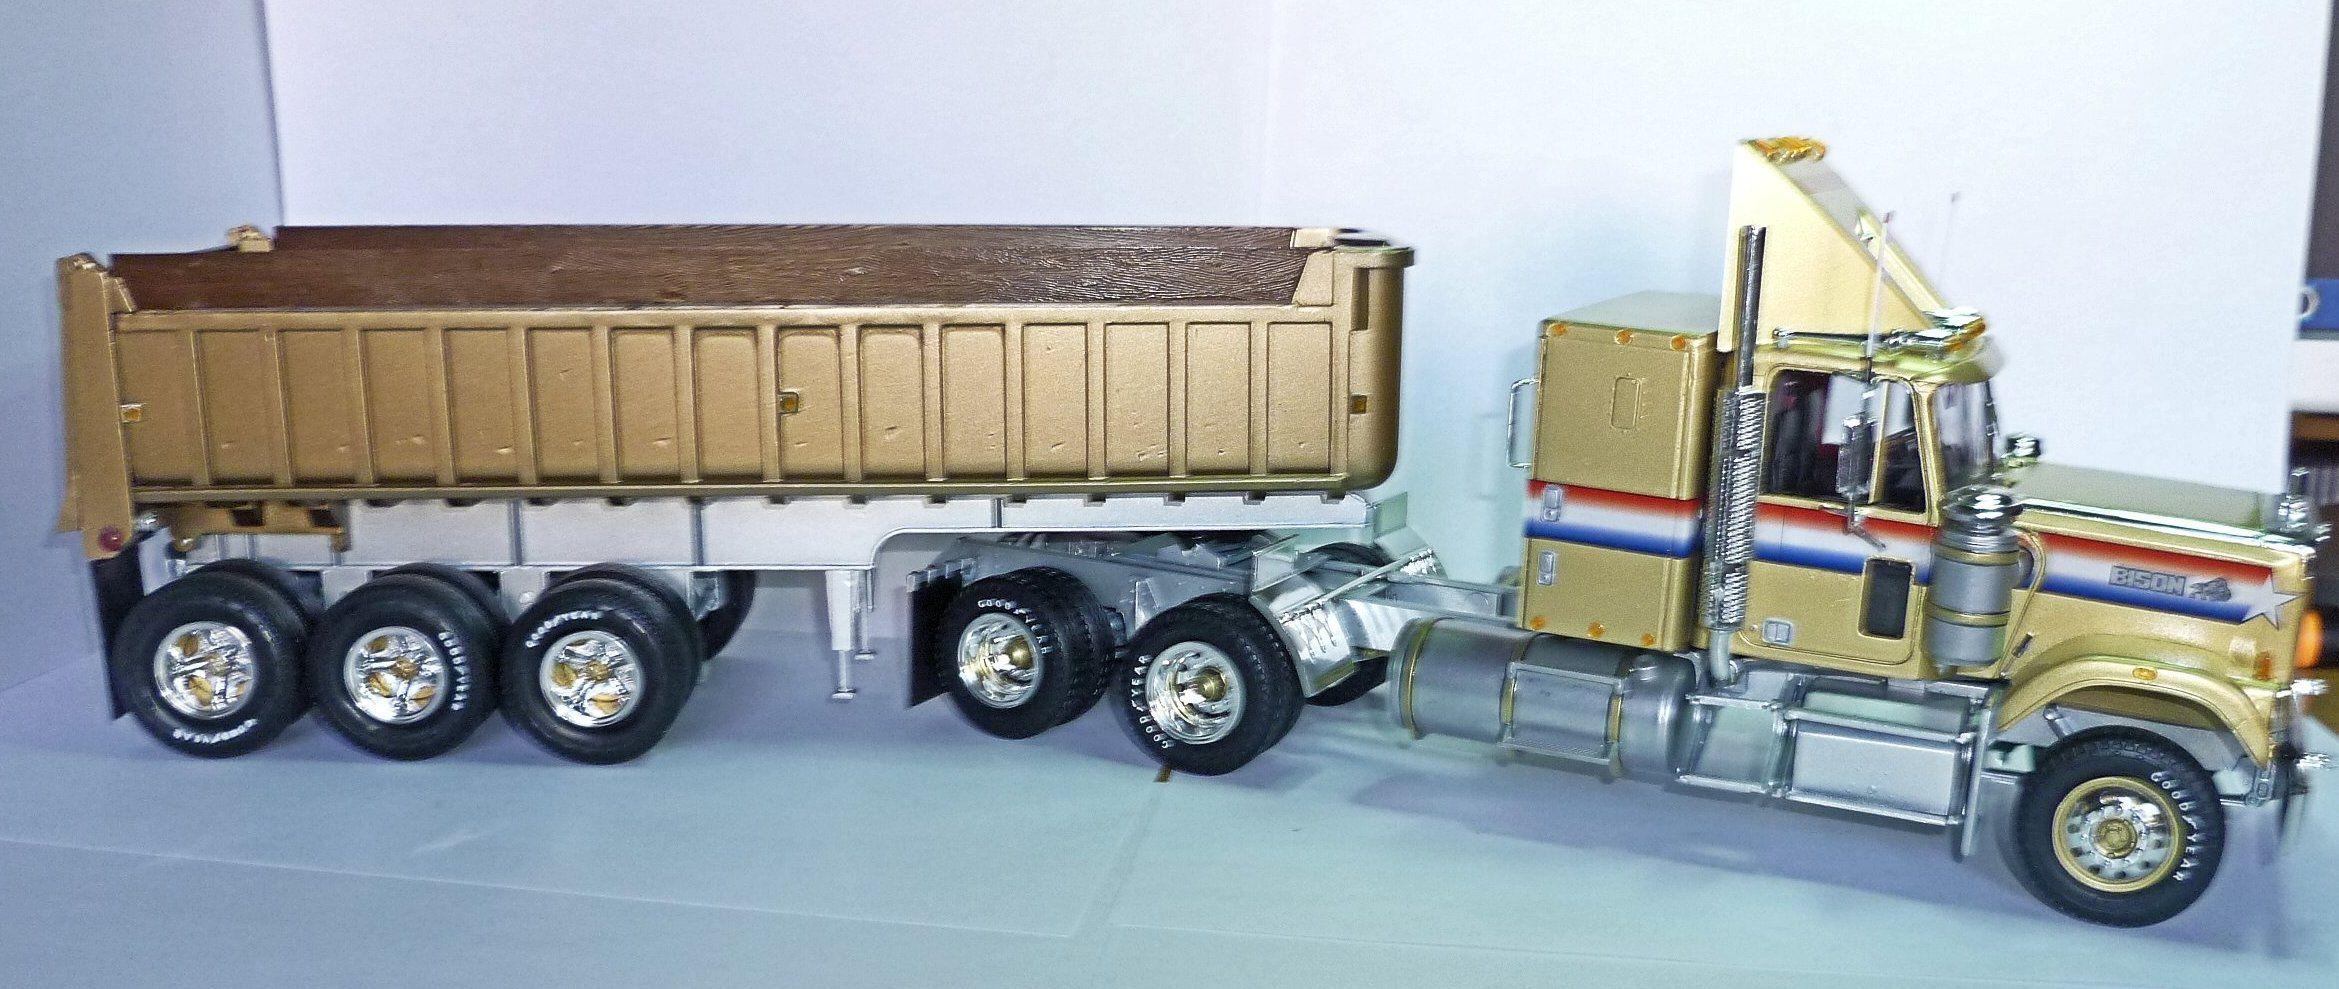 Gmc General 1978 With Dump Gravel Trailer 975 Plastic Model Cars